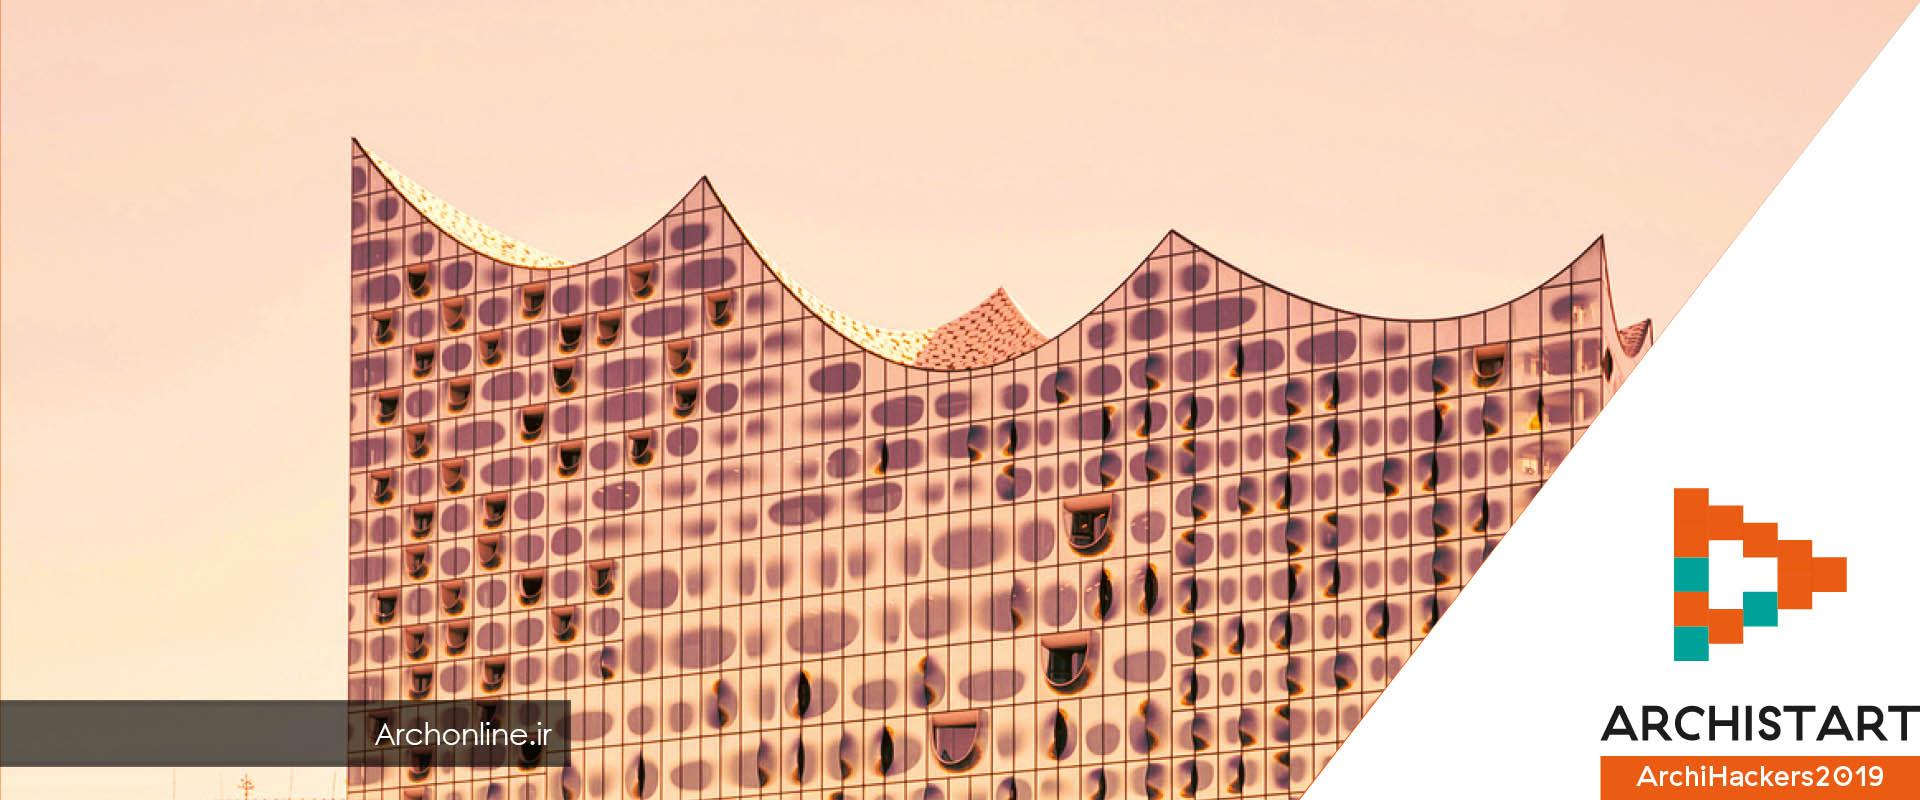 فراخوان رقابت معماری ArchiHackers2019